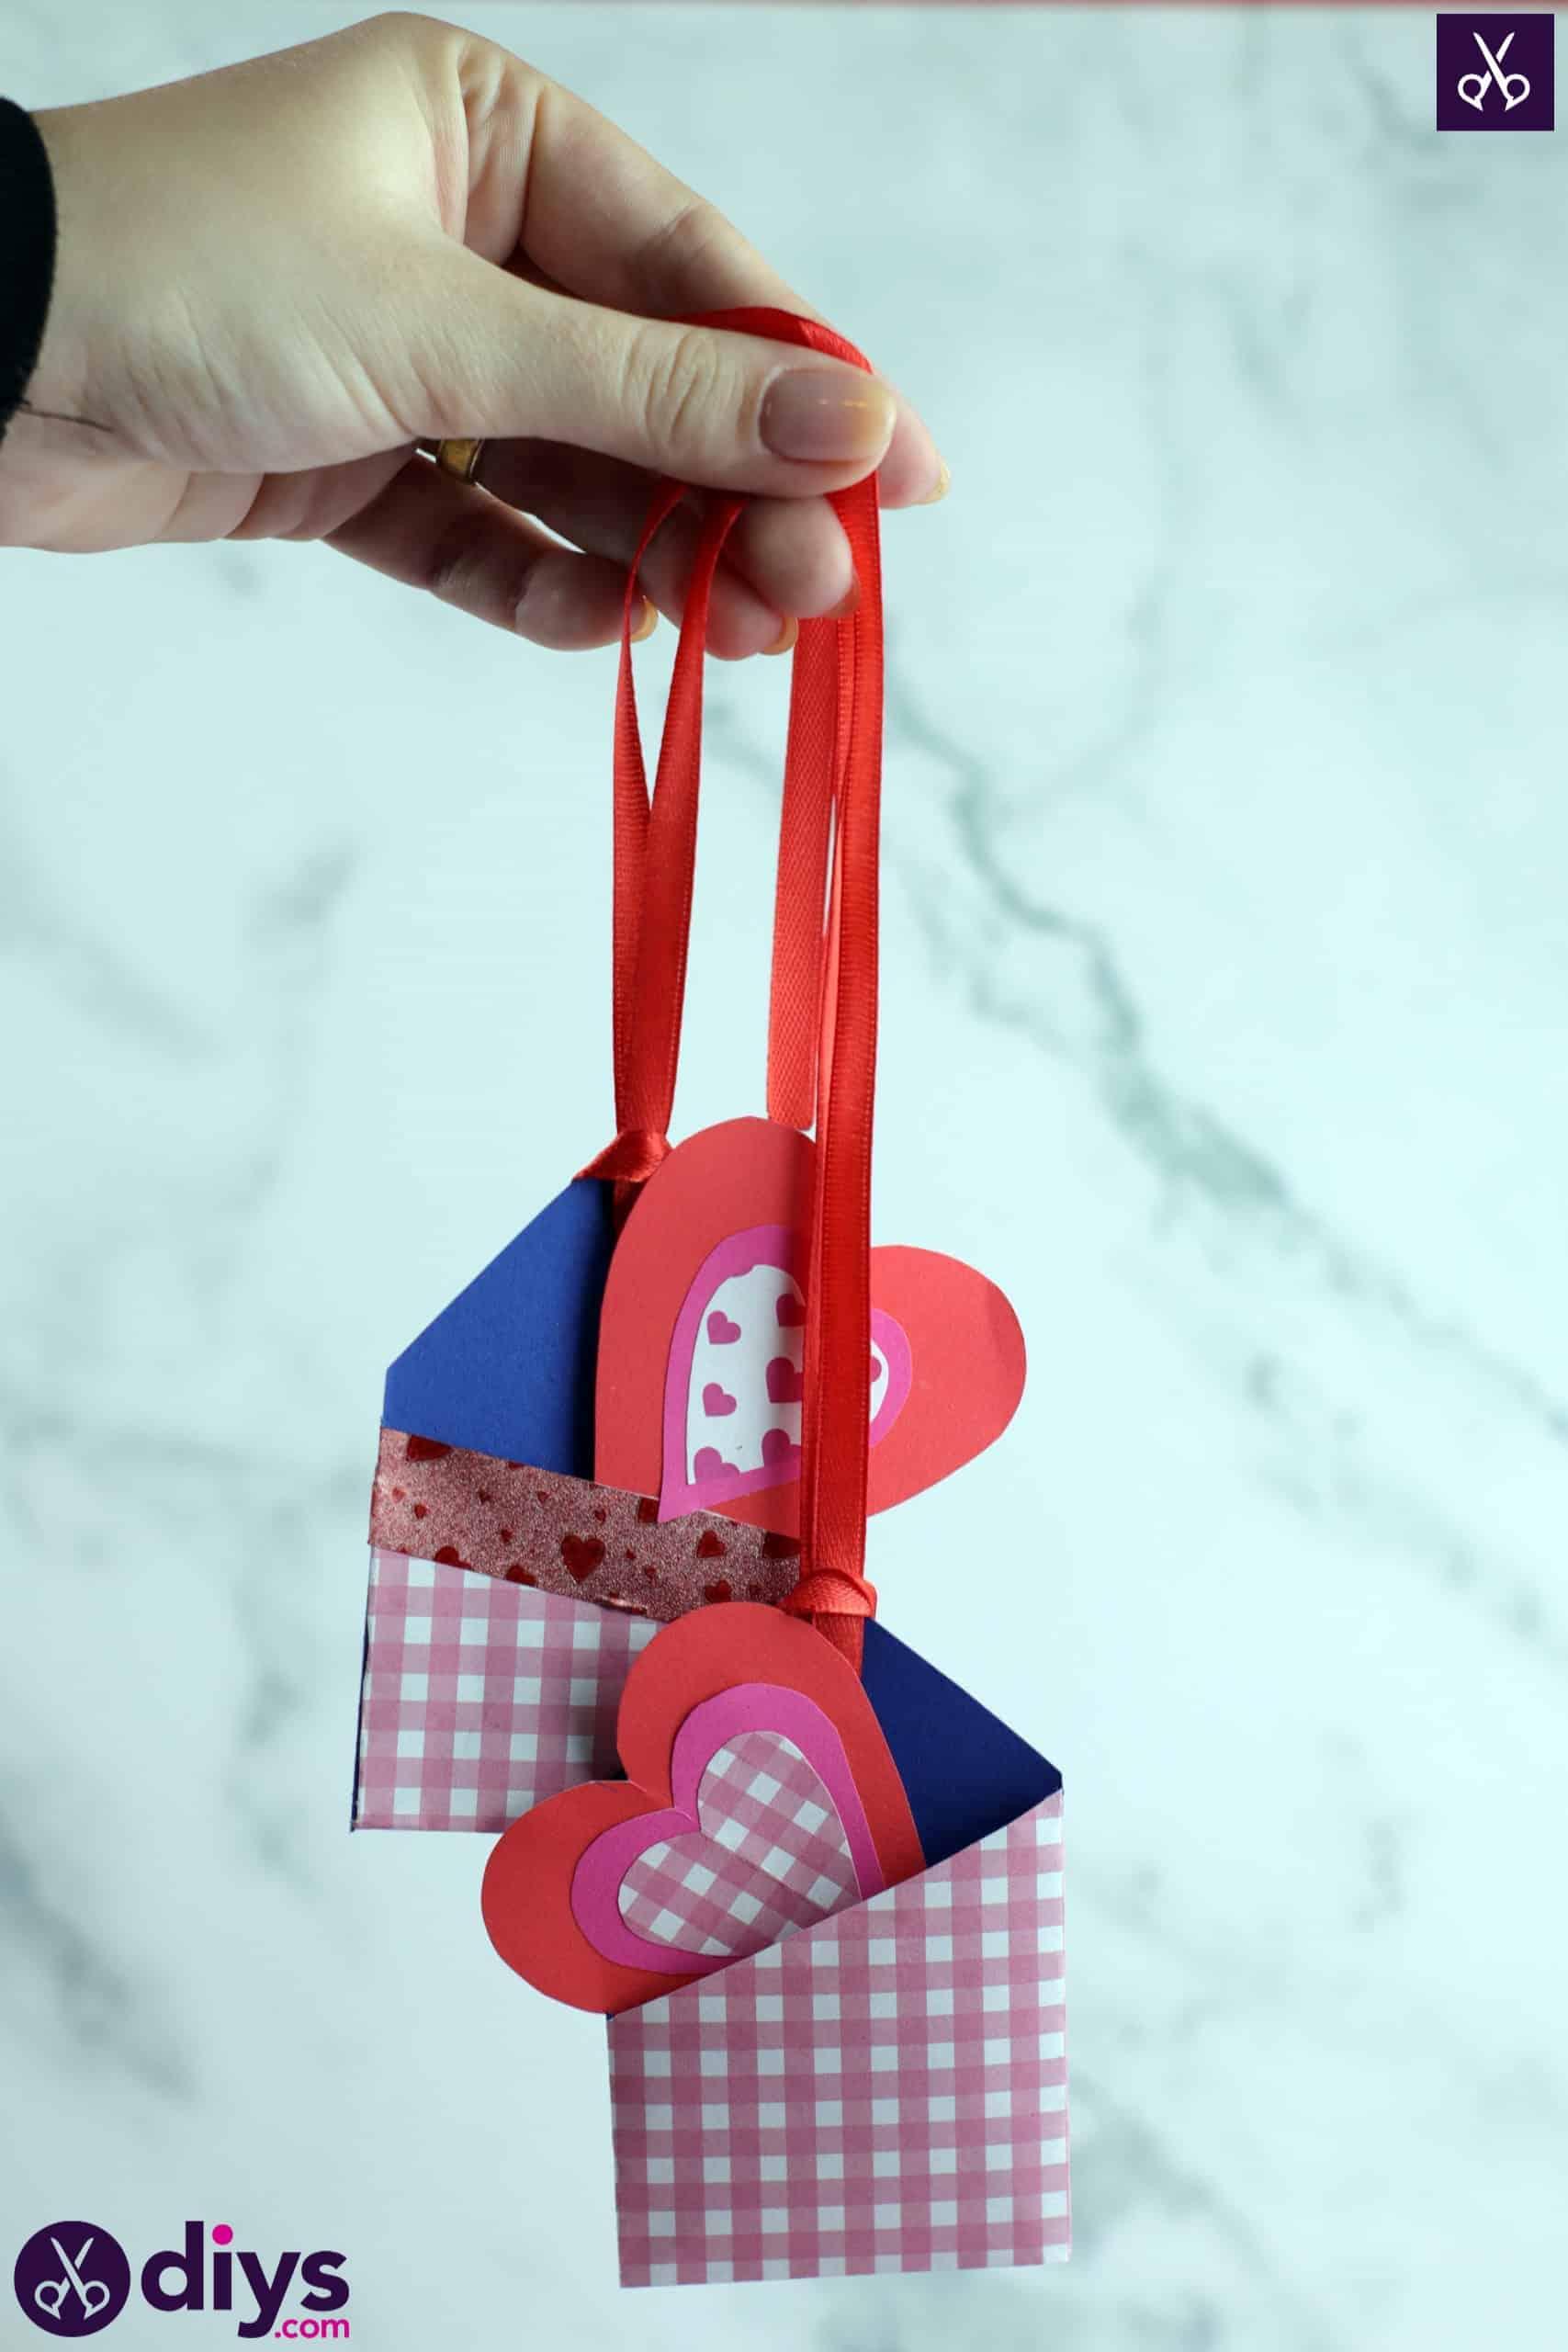 Diy pocketed gift tags